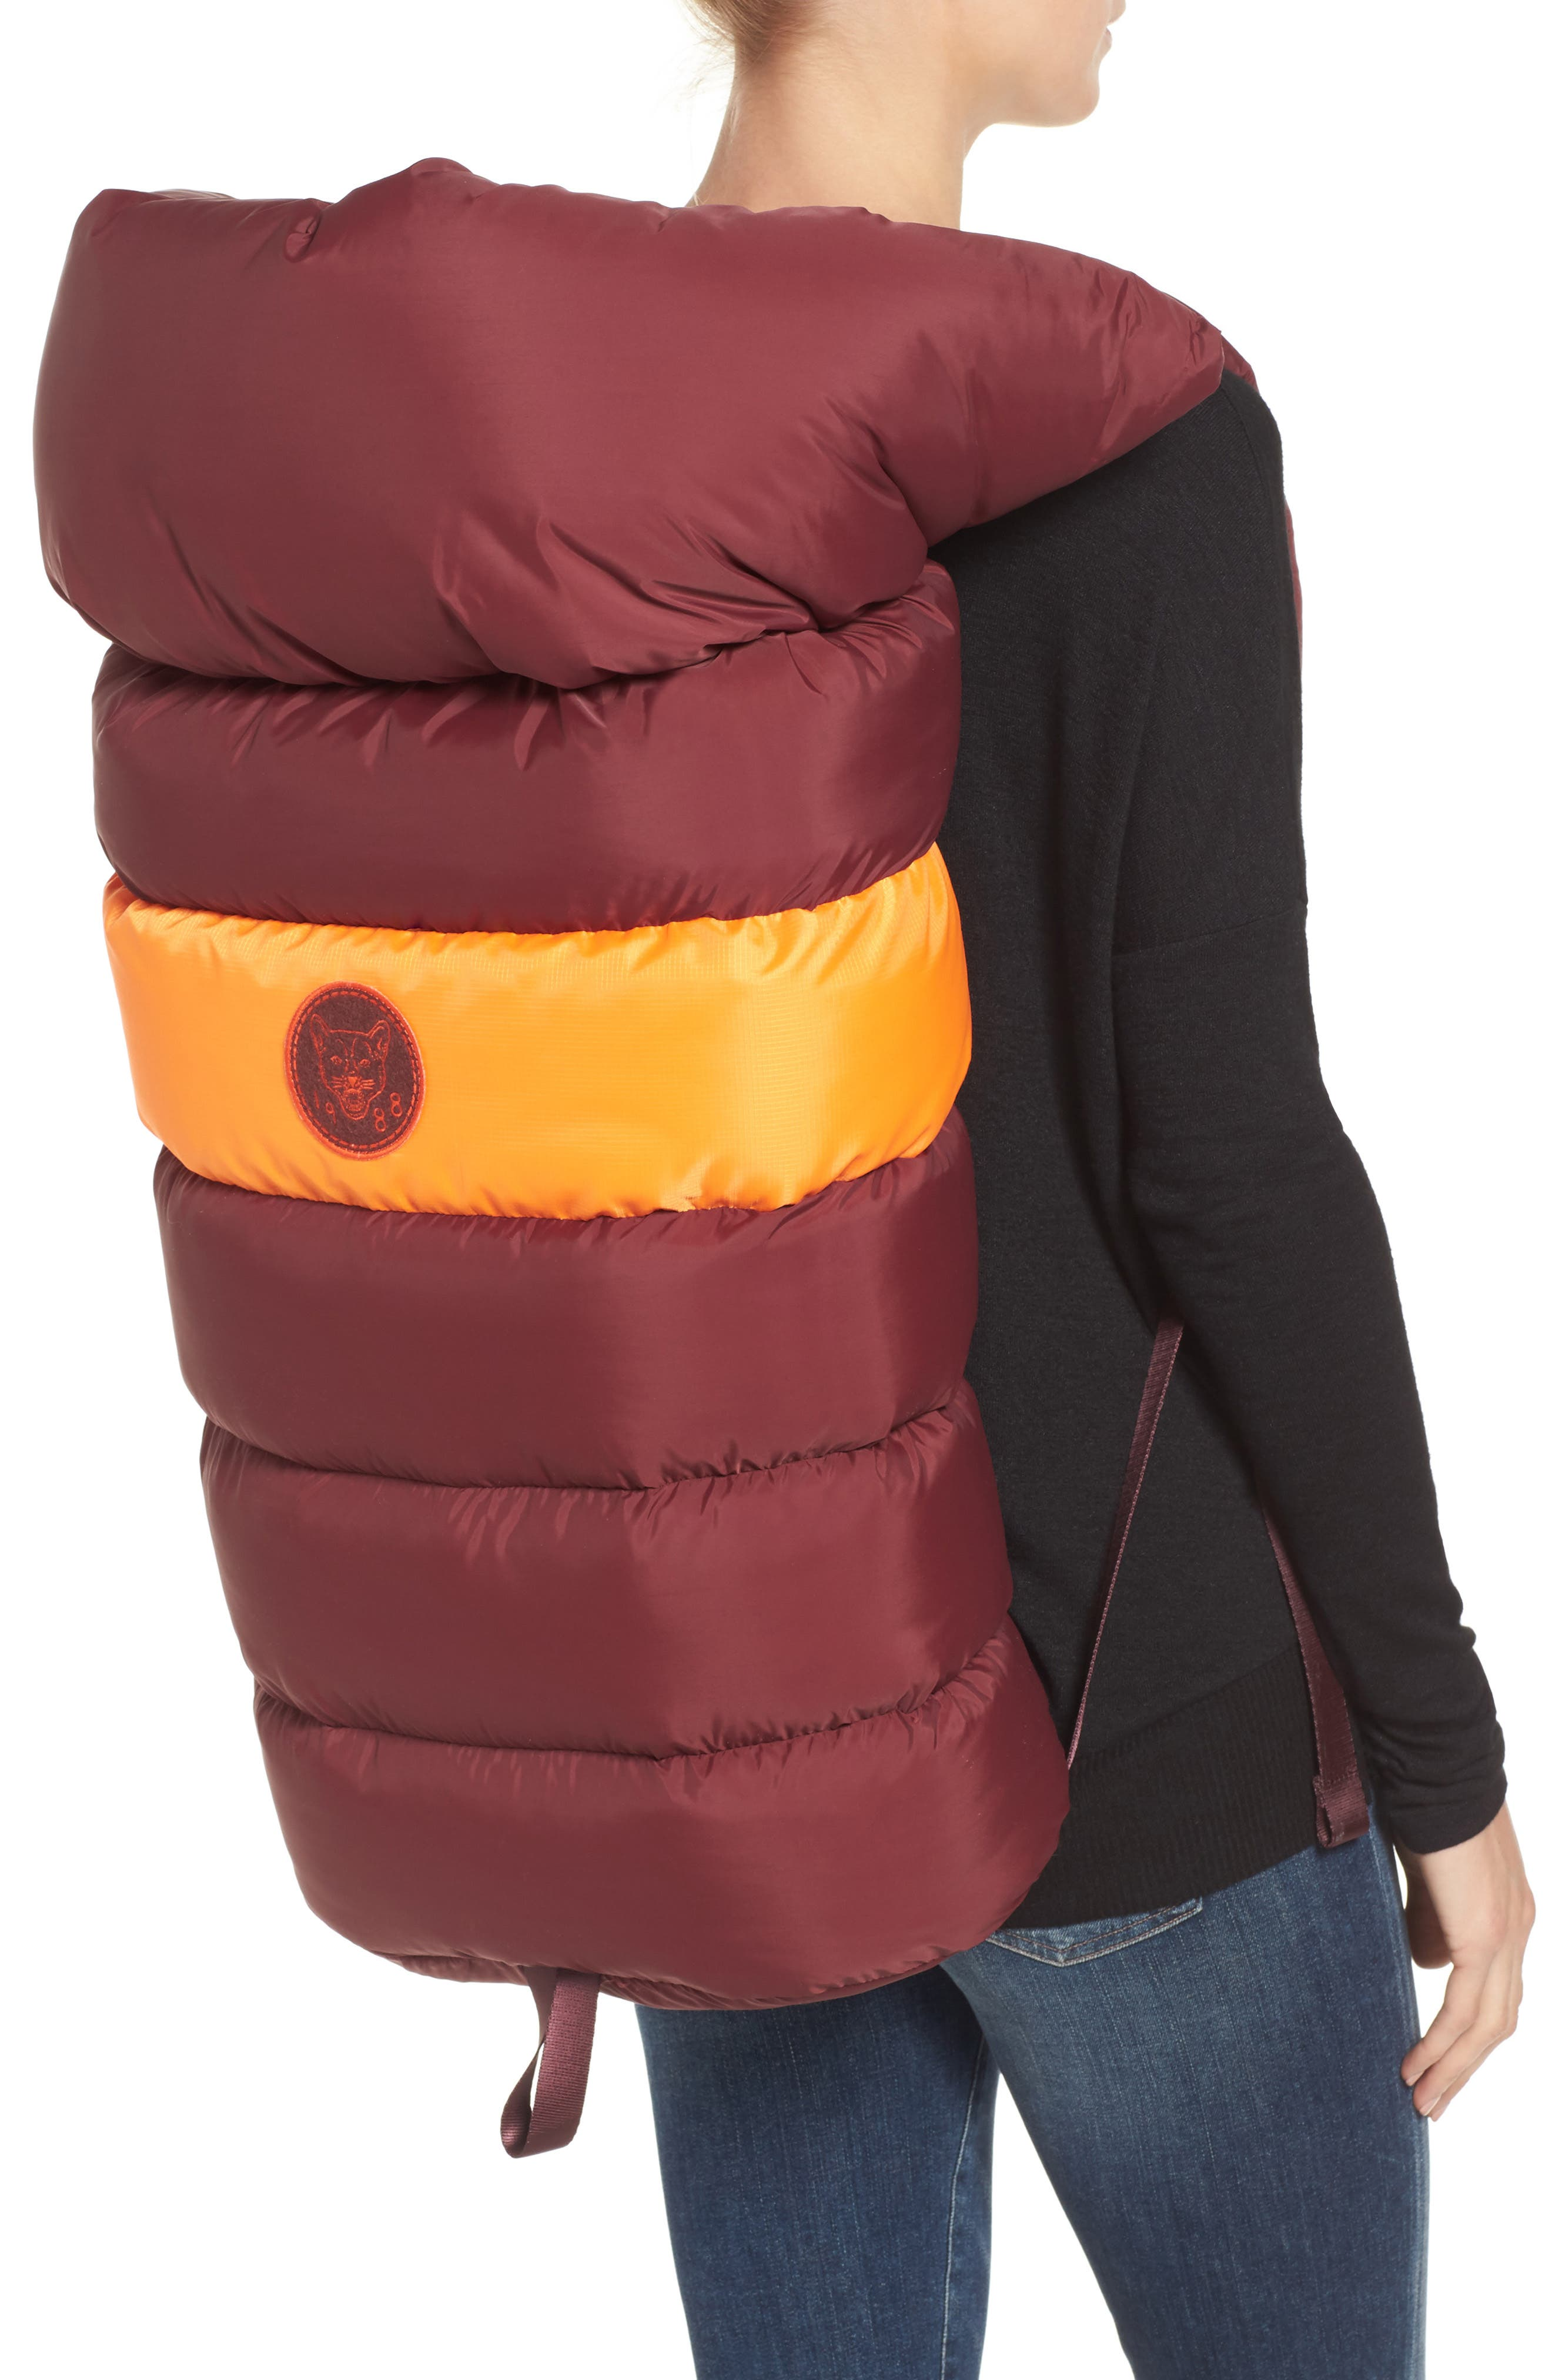 PUMA by Rihanna Backpack,                             Alternate thumbnail 2, color,                             Burgundy Orange